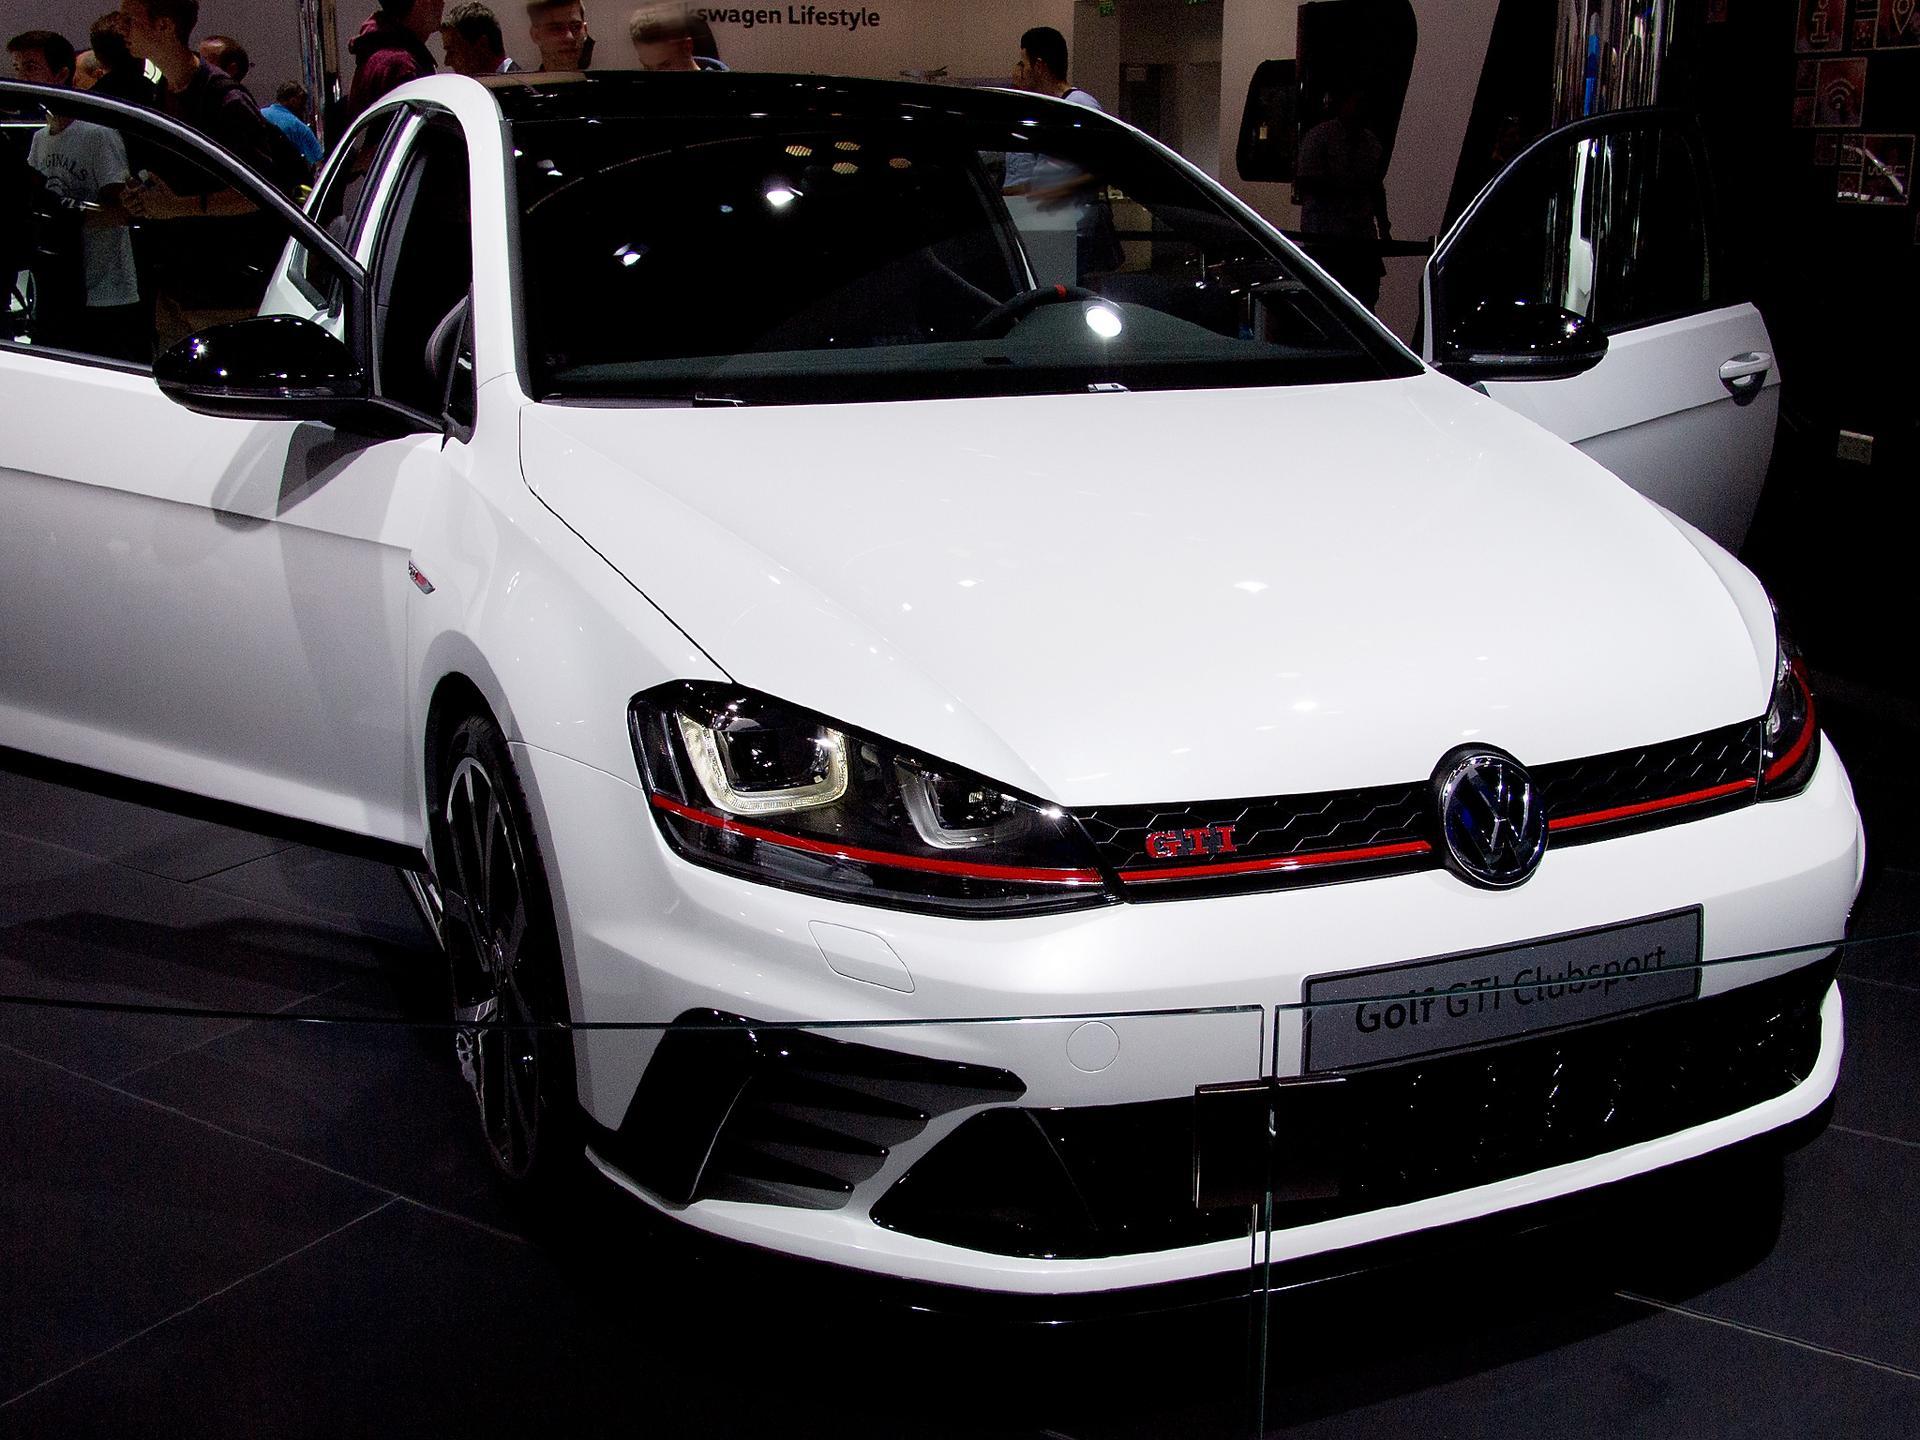 Volkswagen Eu Golf Gti Clubsport 5 Türig 2 0 Tsi 265ps Dsg6 Navi